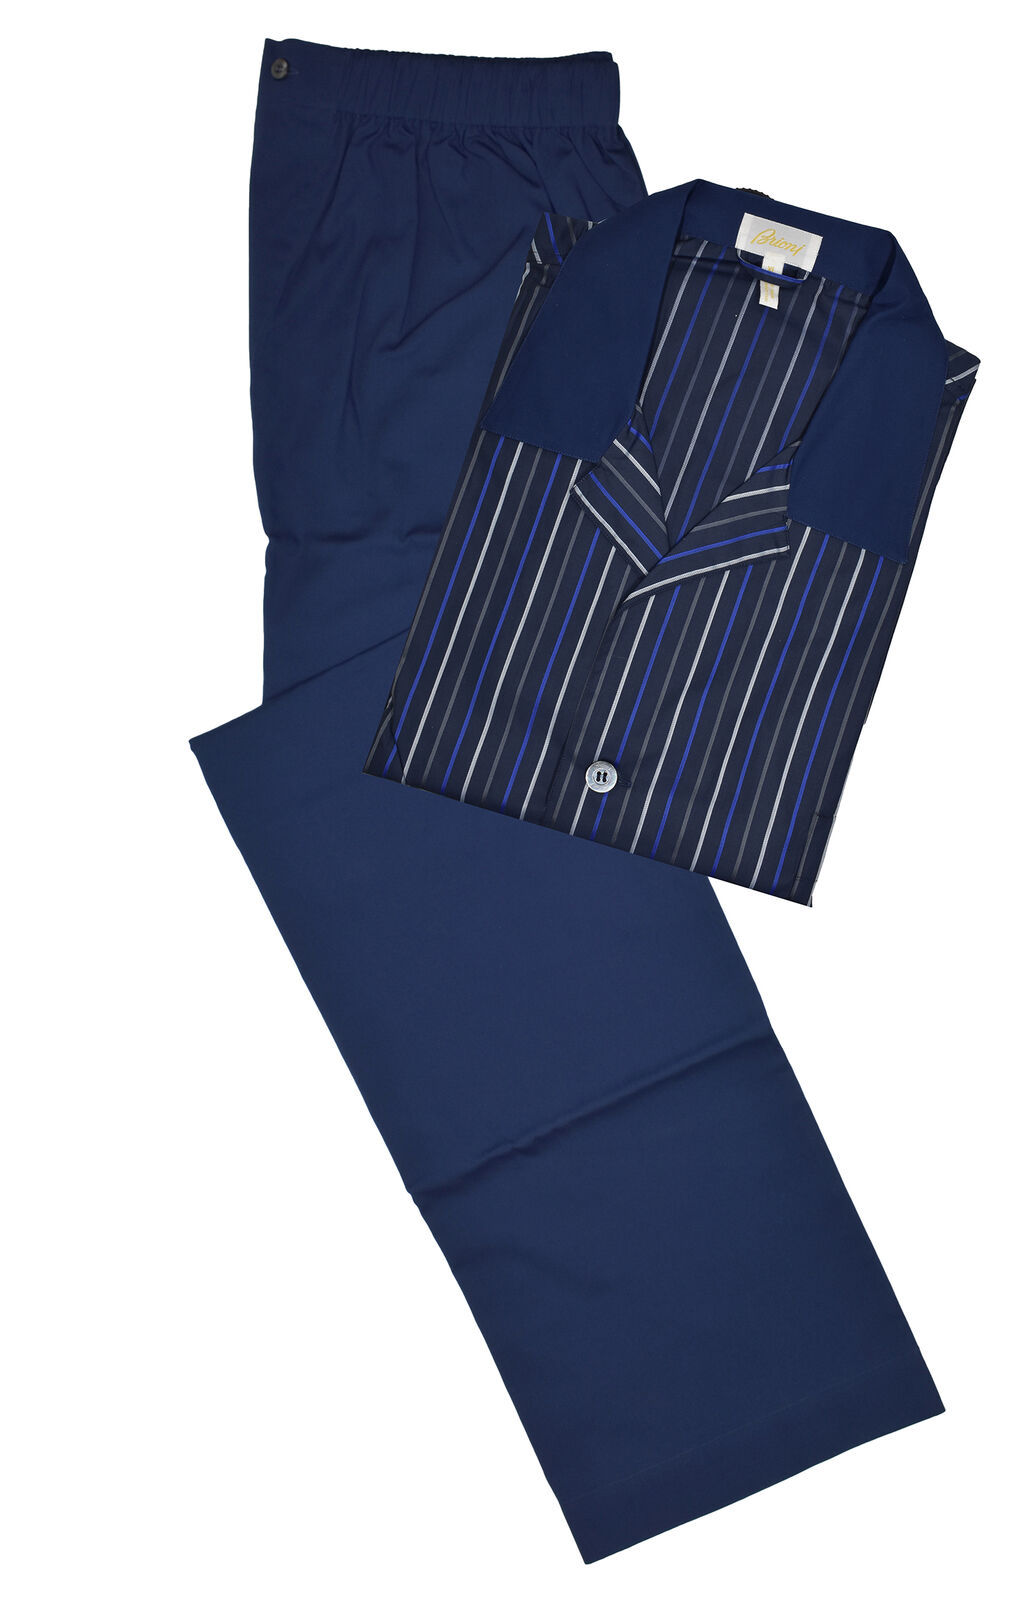 Brioni Men's bluee 100% Cotton Striped Pajamas